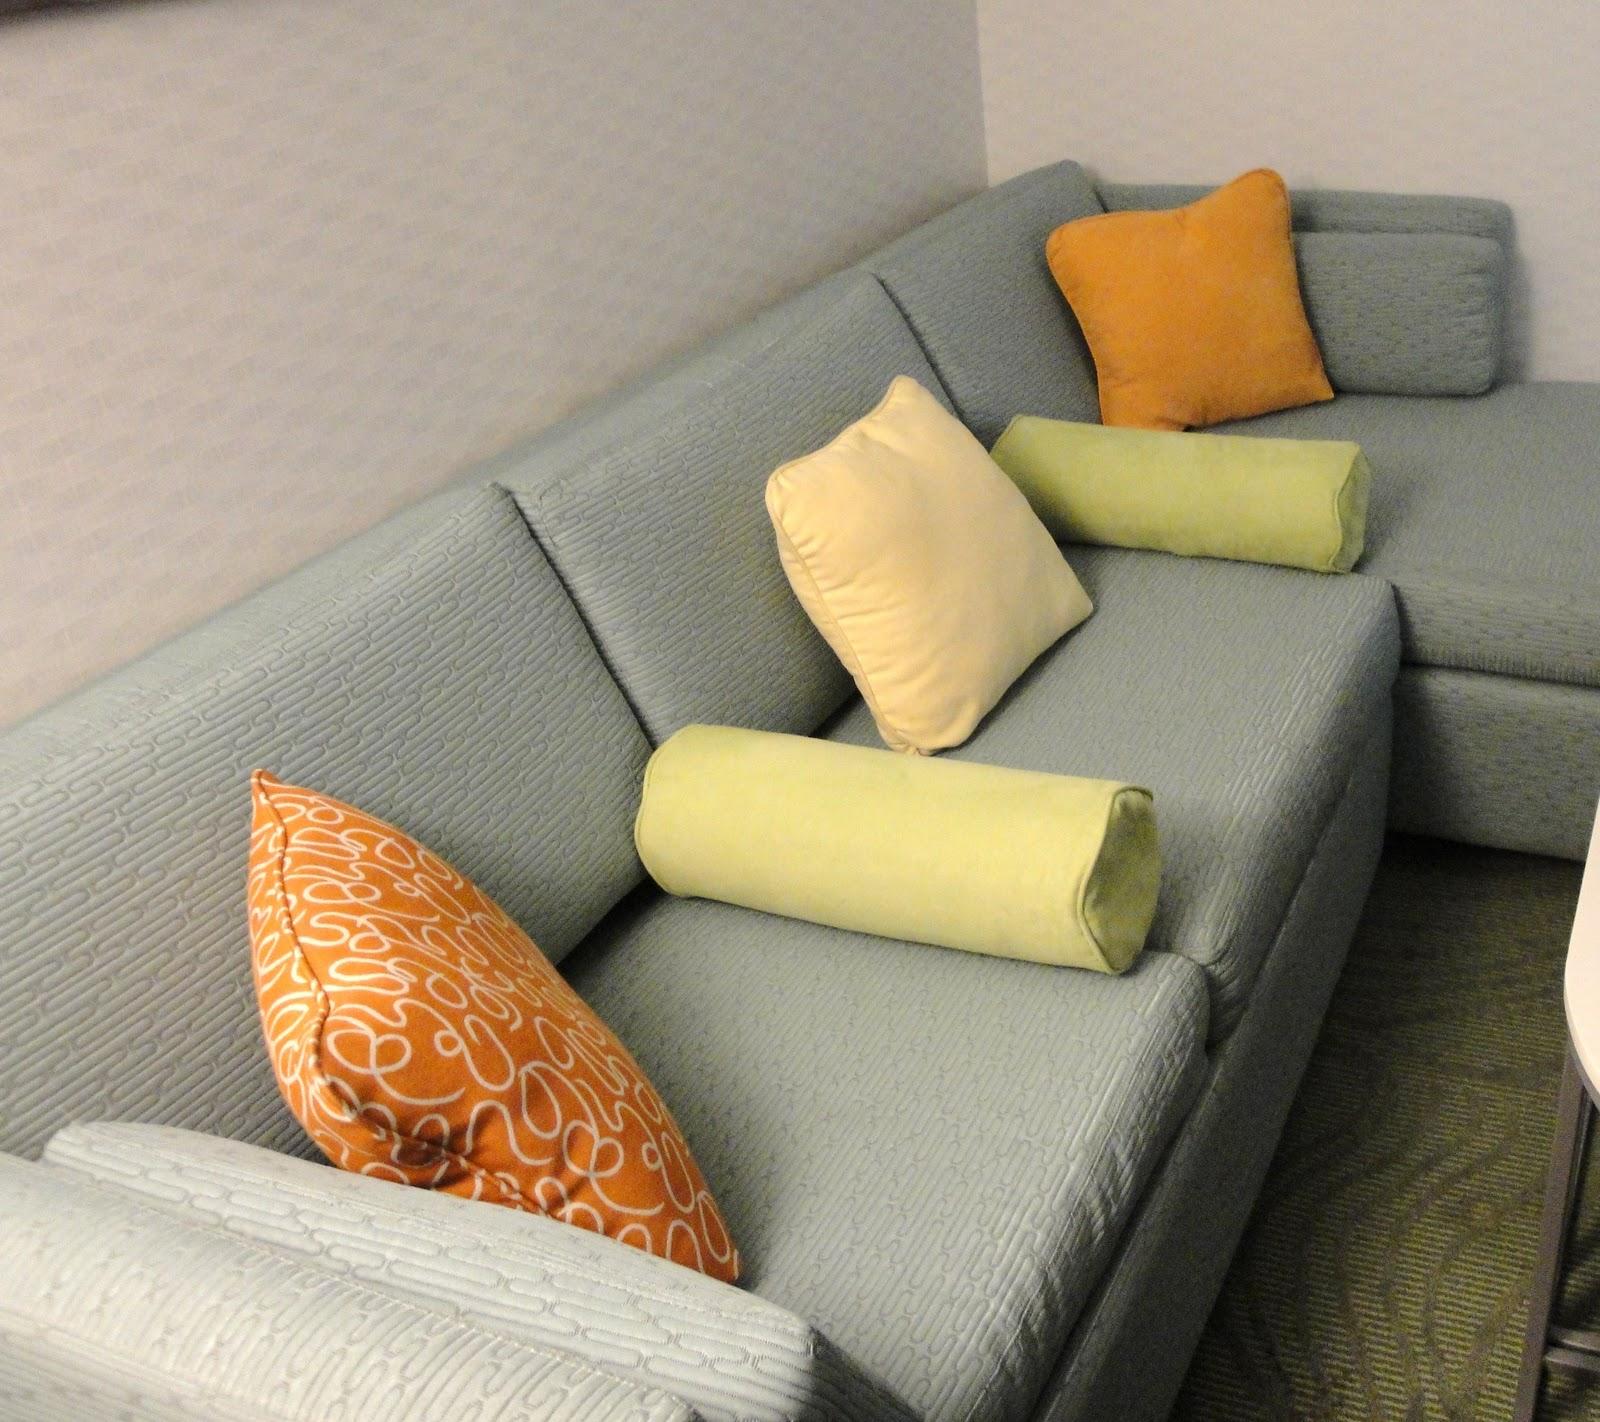 Green bolster pillow home ideas for Where to buy sofa pillows